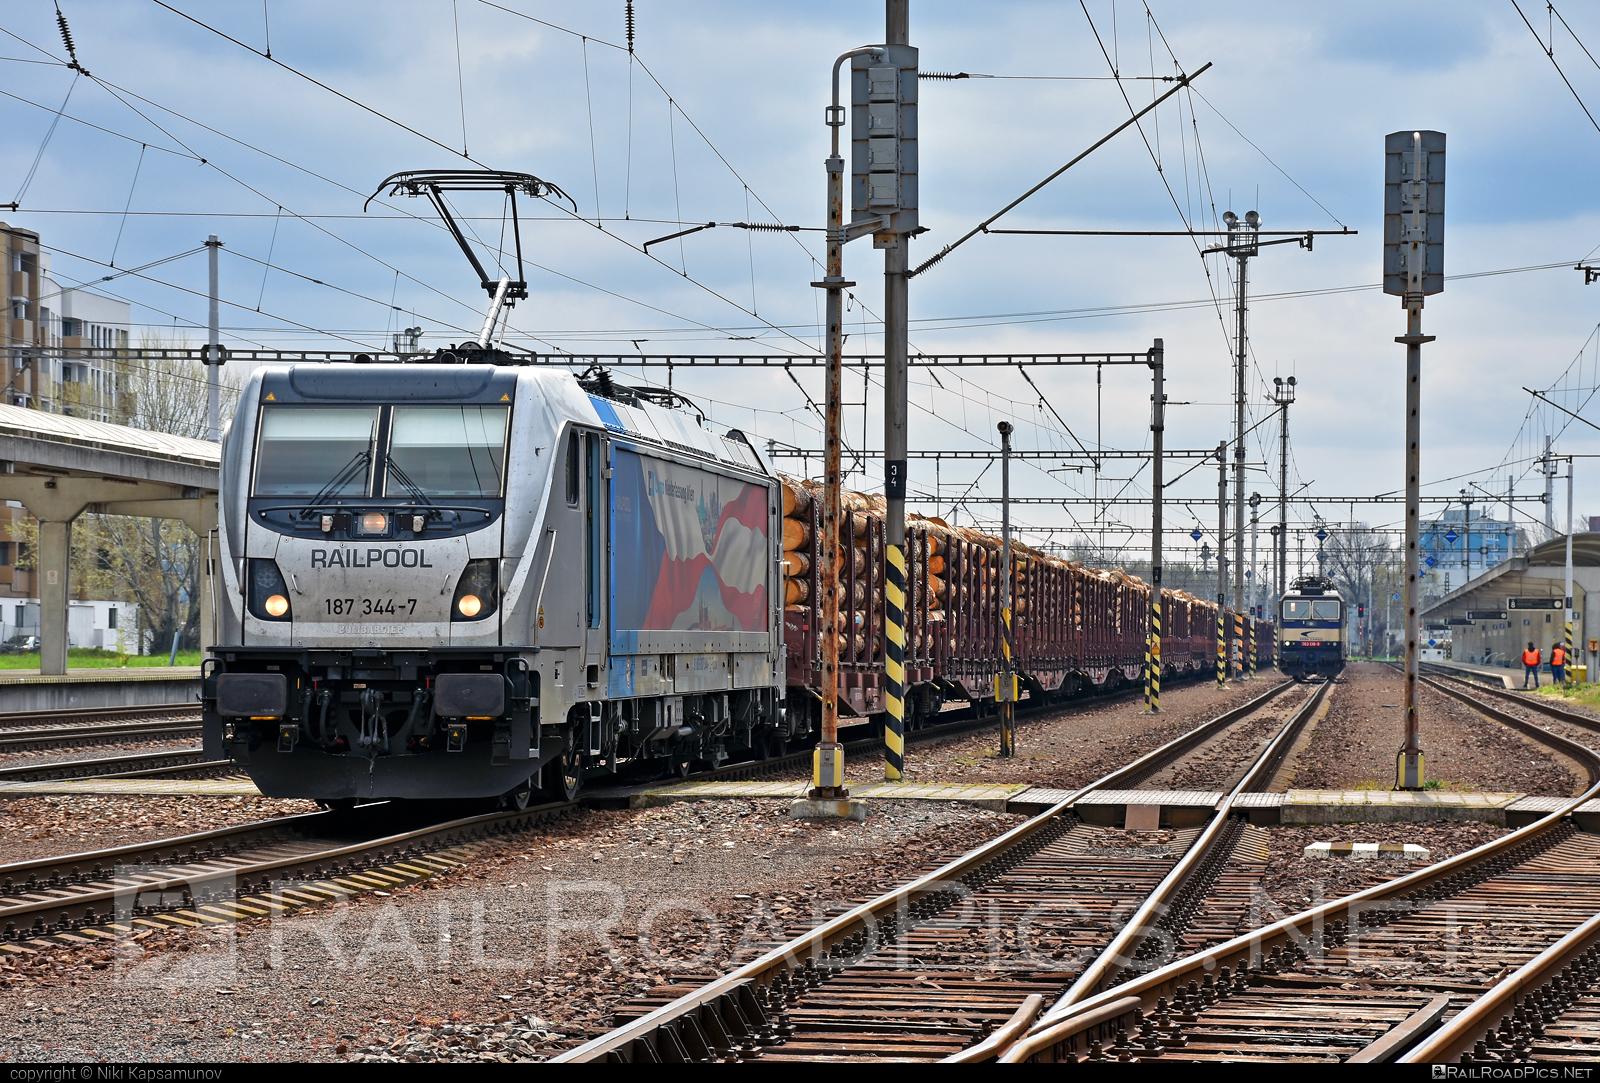 Bombardier TRAXX F160 AC3 - 187 344-7 operated by ČD Cargo, a.s. #bombardier #bombardiertraxx #cdcargo #cdcargoniederlassungwien #railpool #railpoolgmbh #traxx #traxxf160 #traxxf160ac #traxxf160ac3